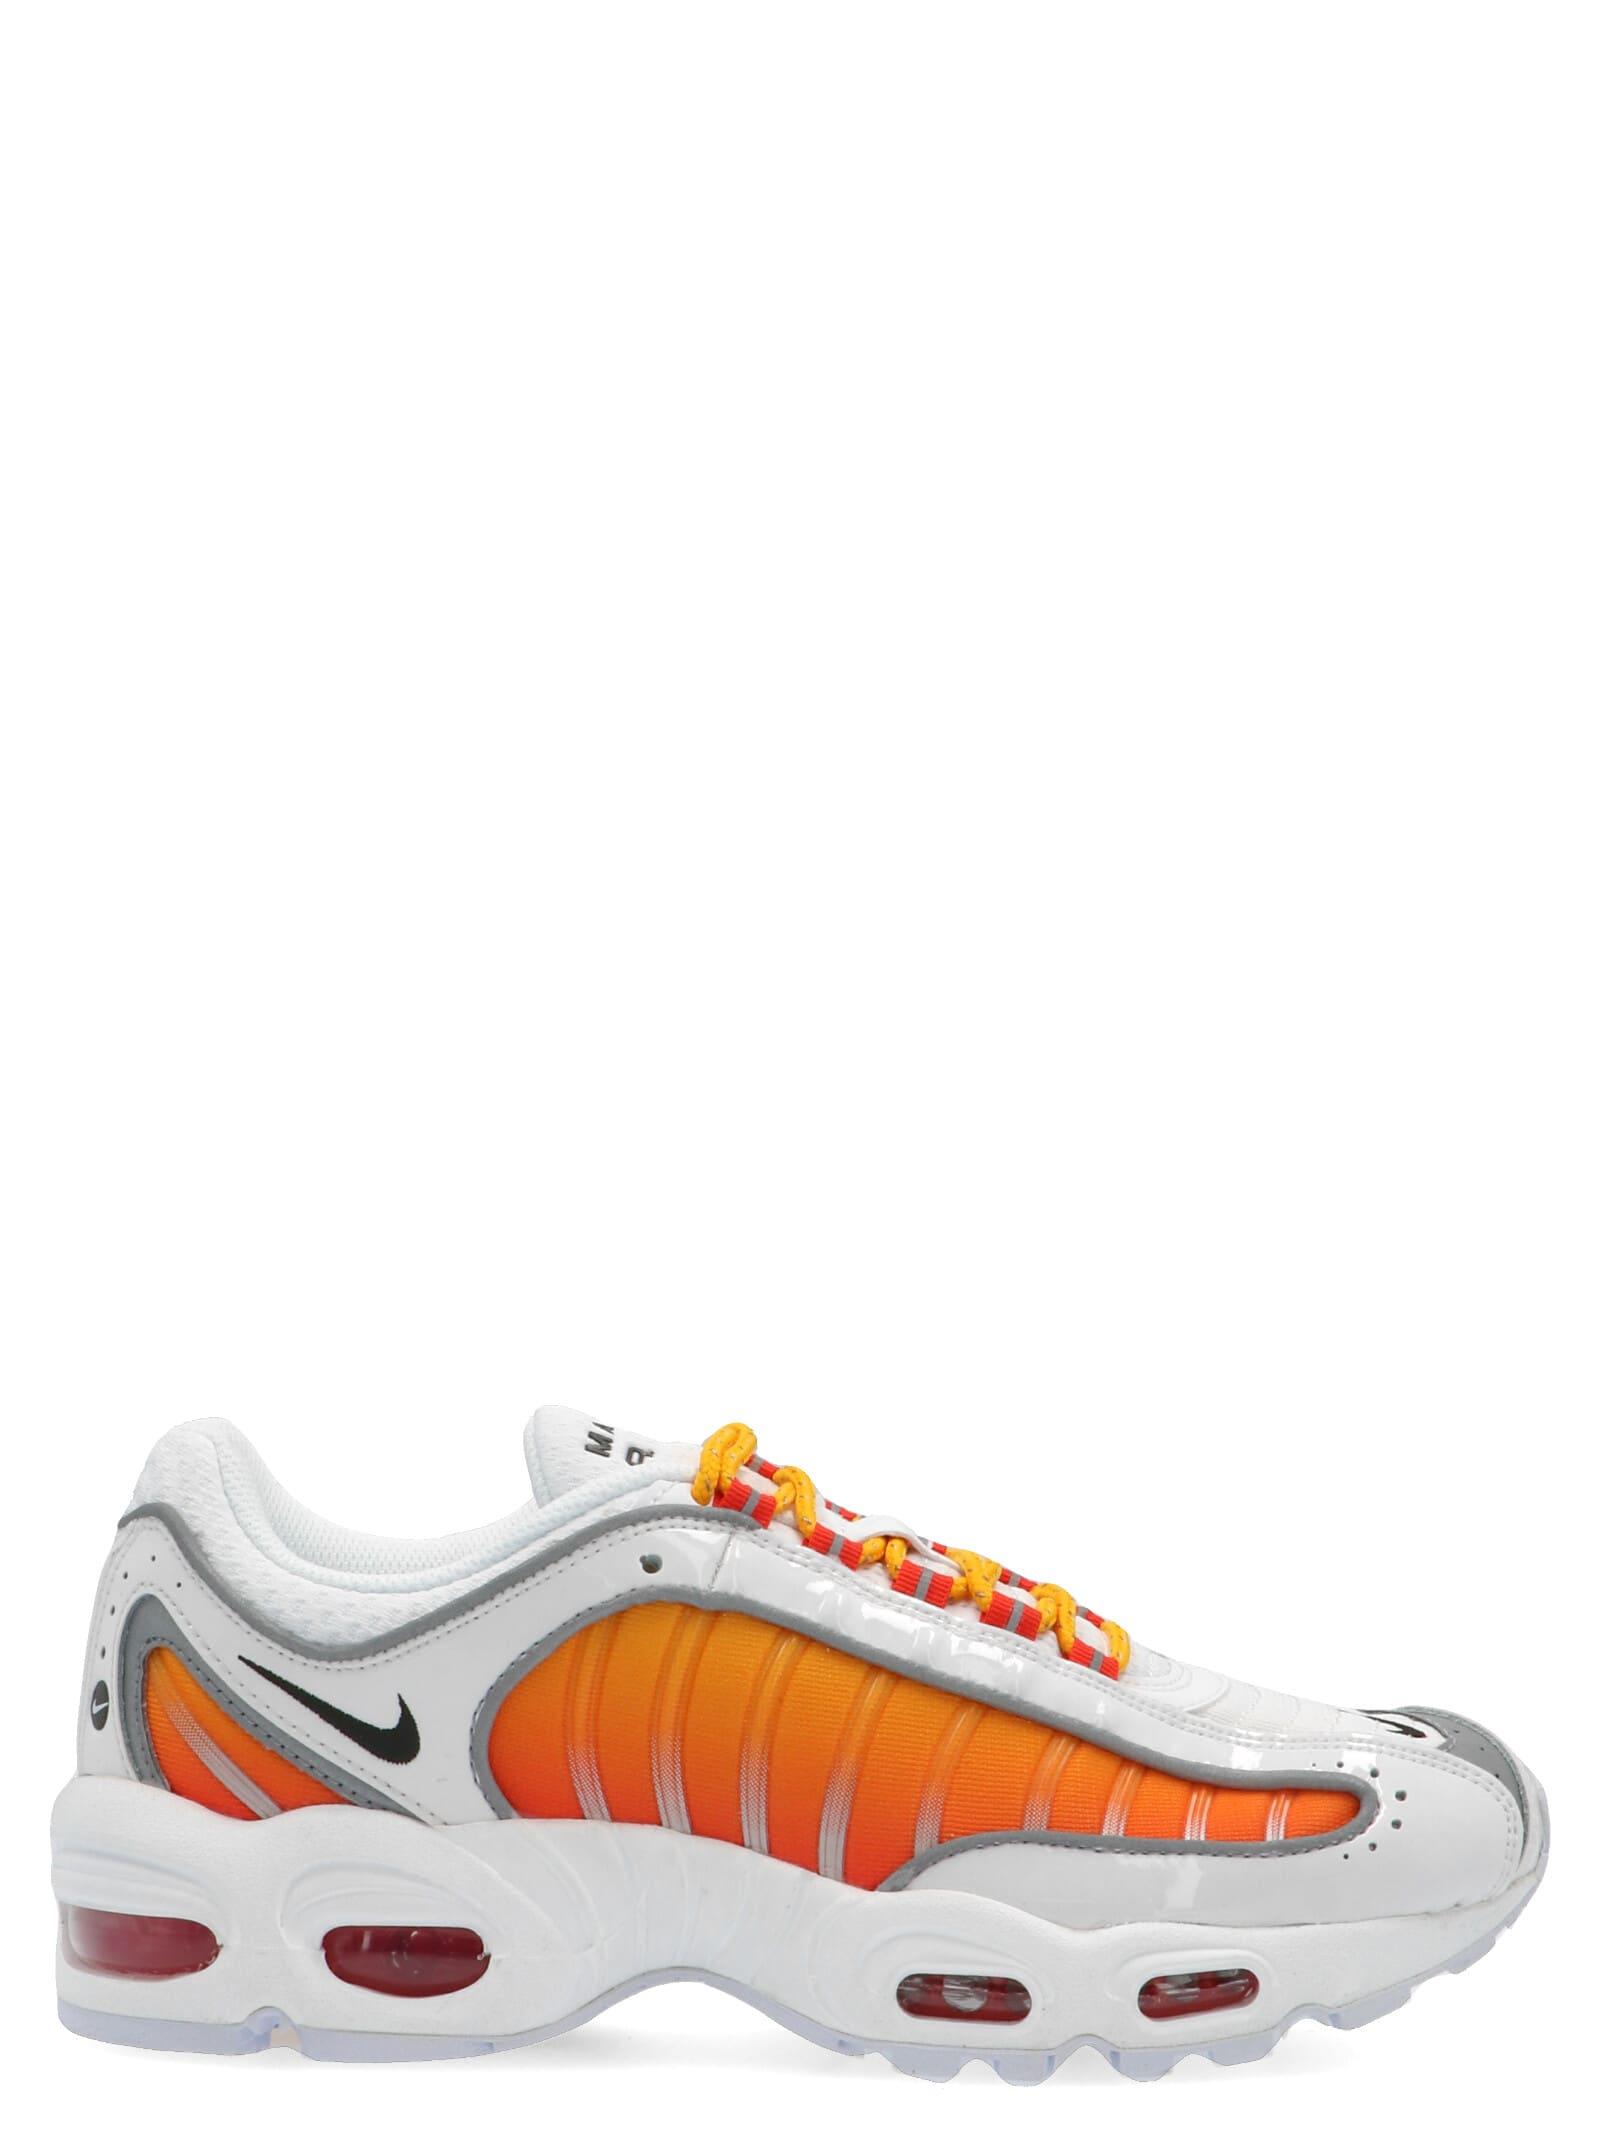 Nike w Air Max Tailwind Iv Nrg Shoes